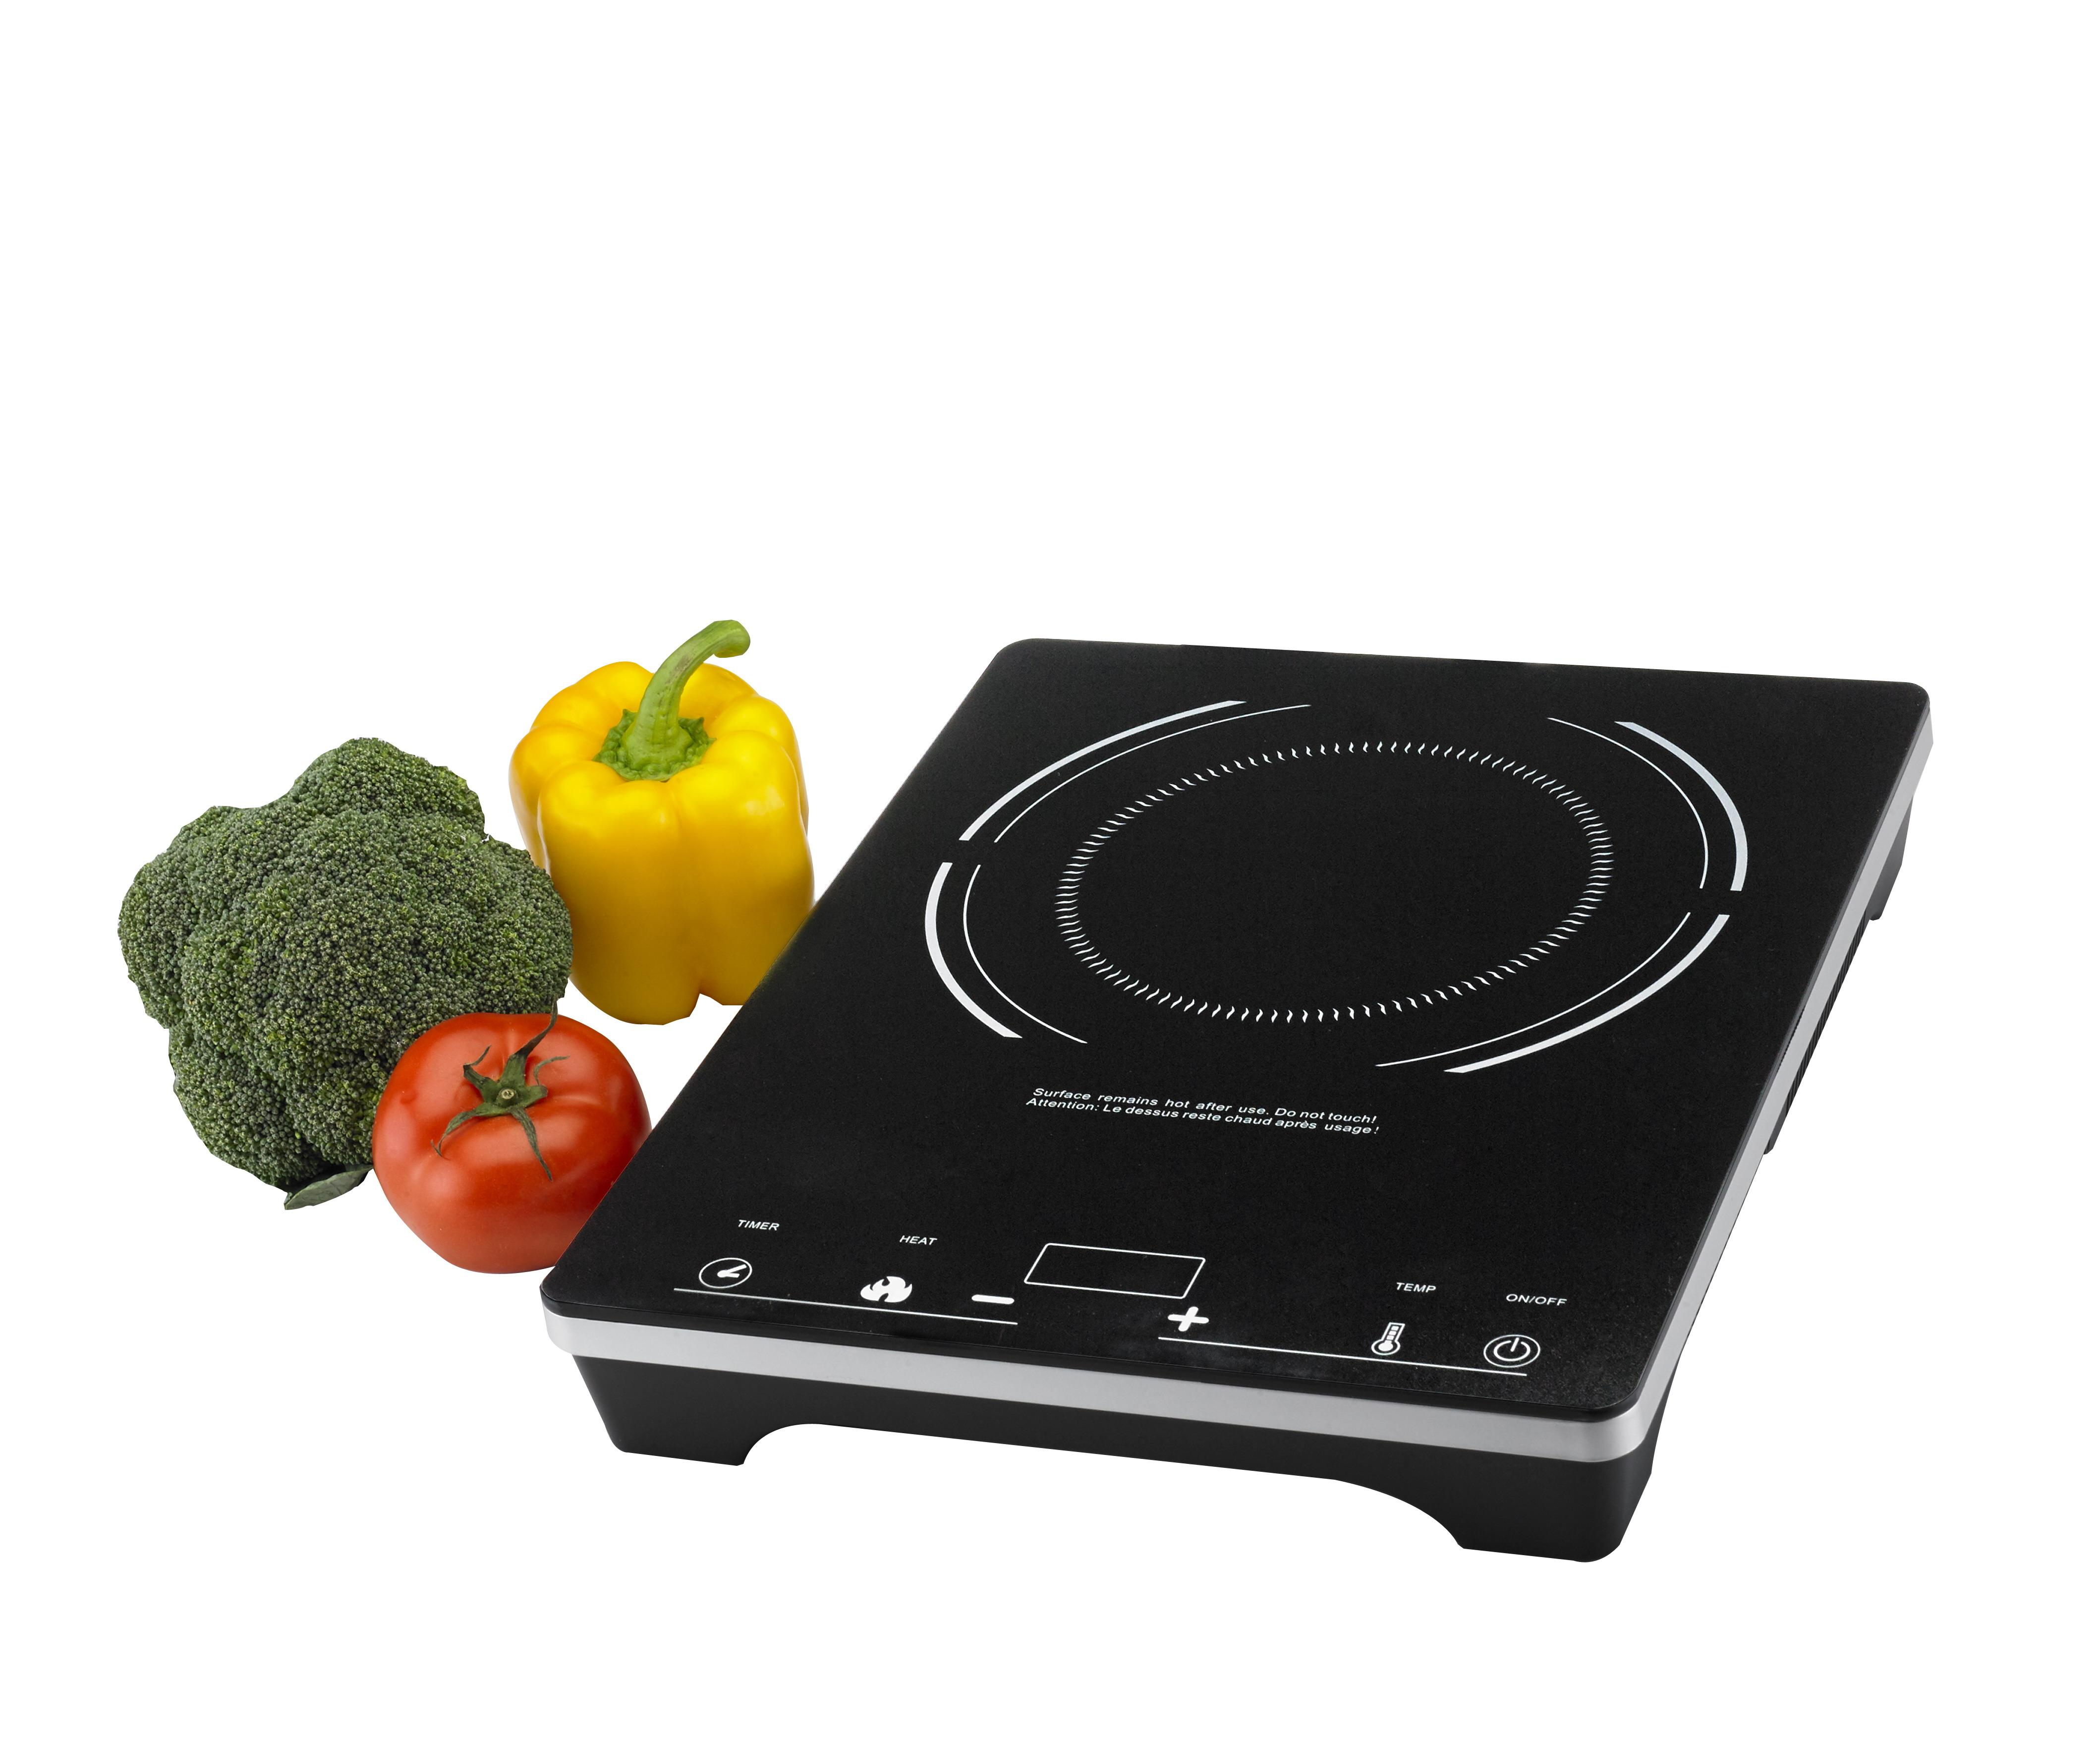 Eurodib USA C1823 induction cookers